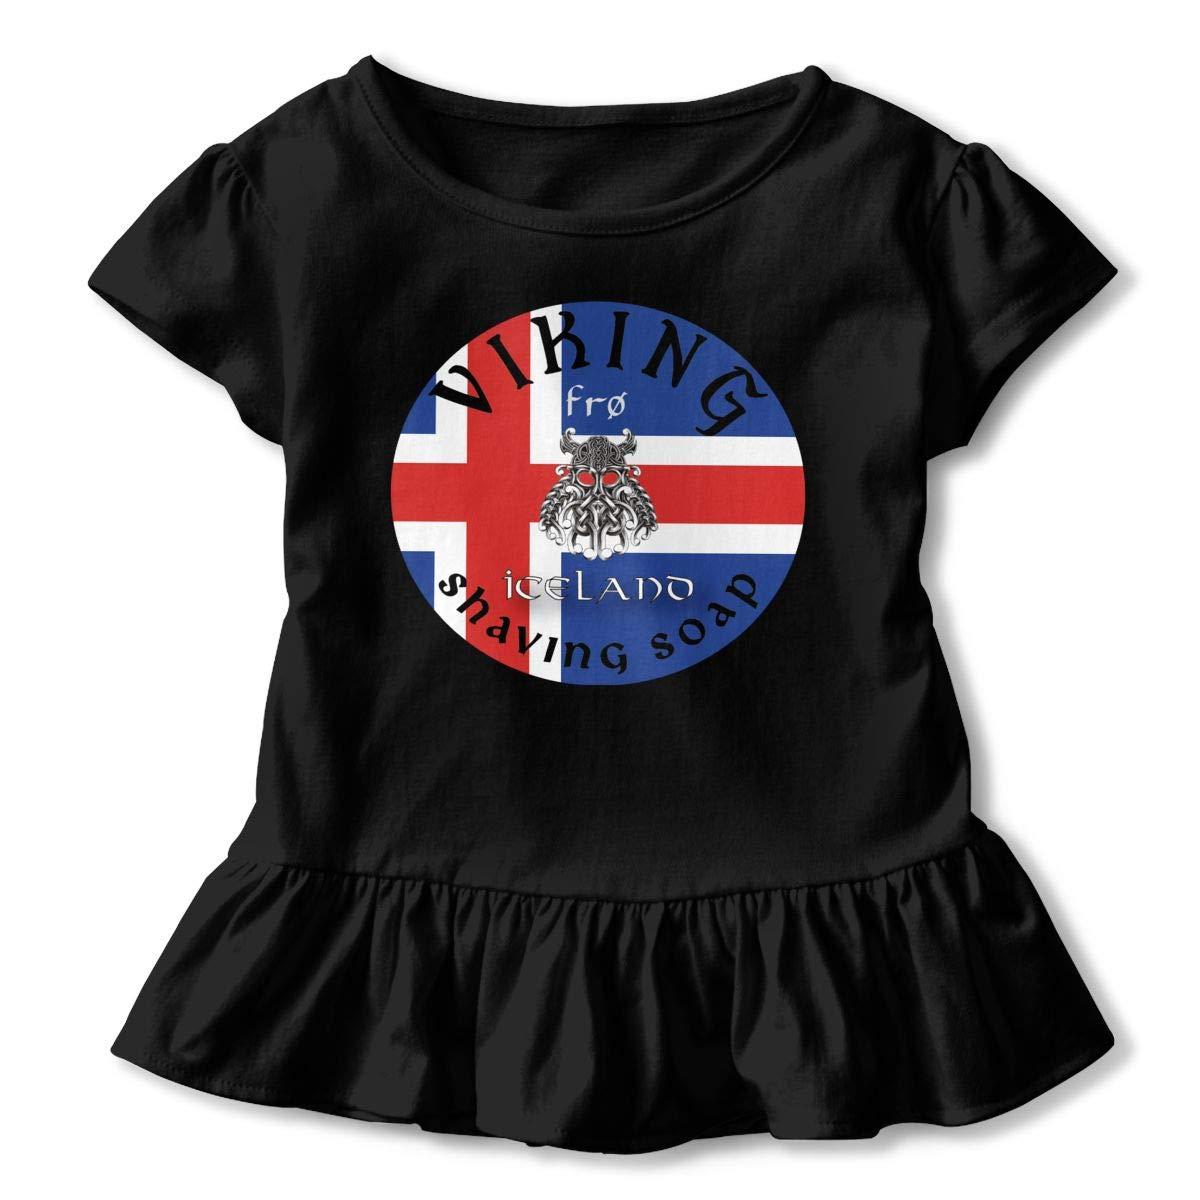 Viking Fr/ø Shaving Soap Shirt Fashion Kids Flounced T Shirts Basic Shirt for 2-6T Kids Girls